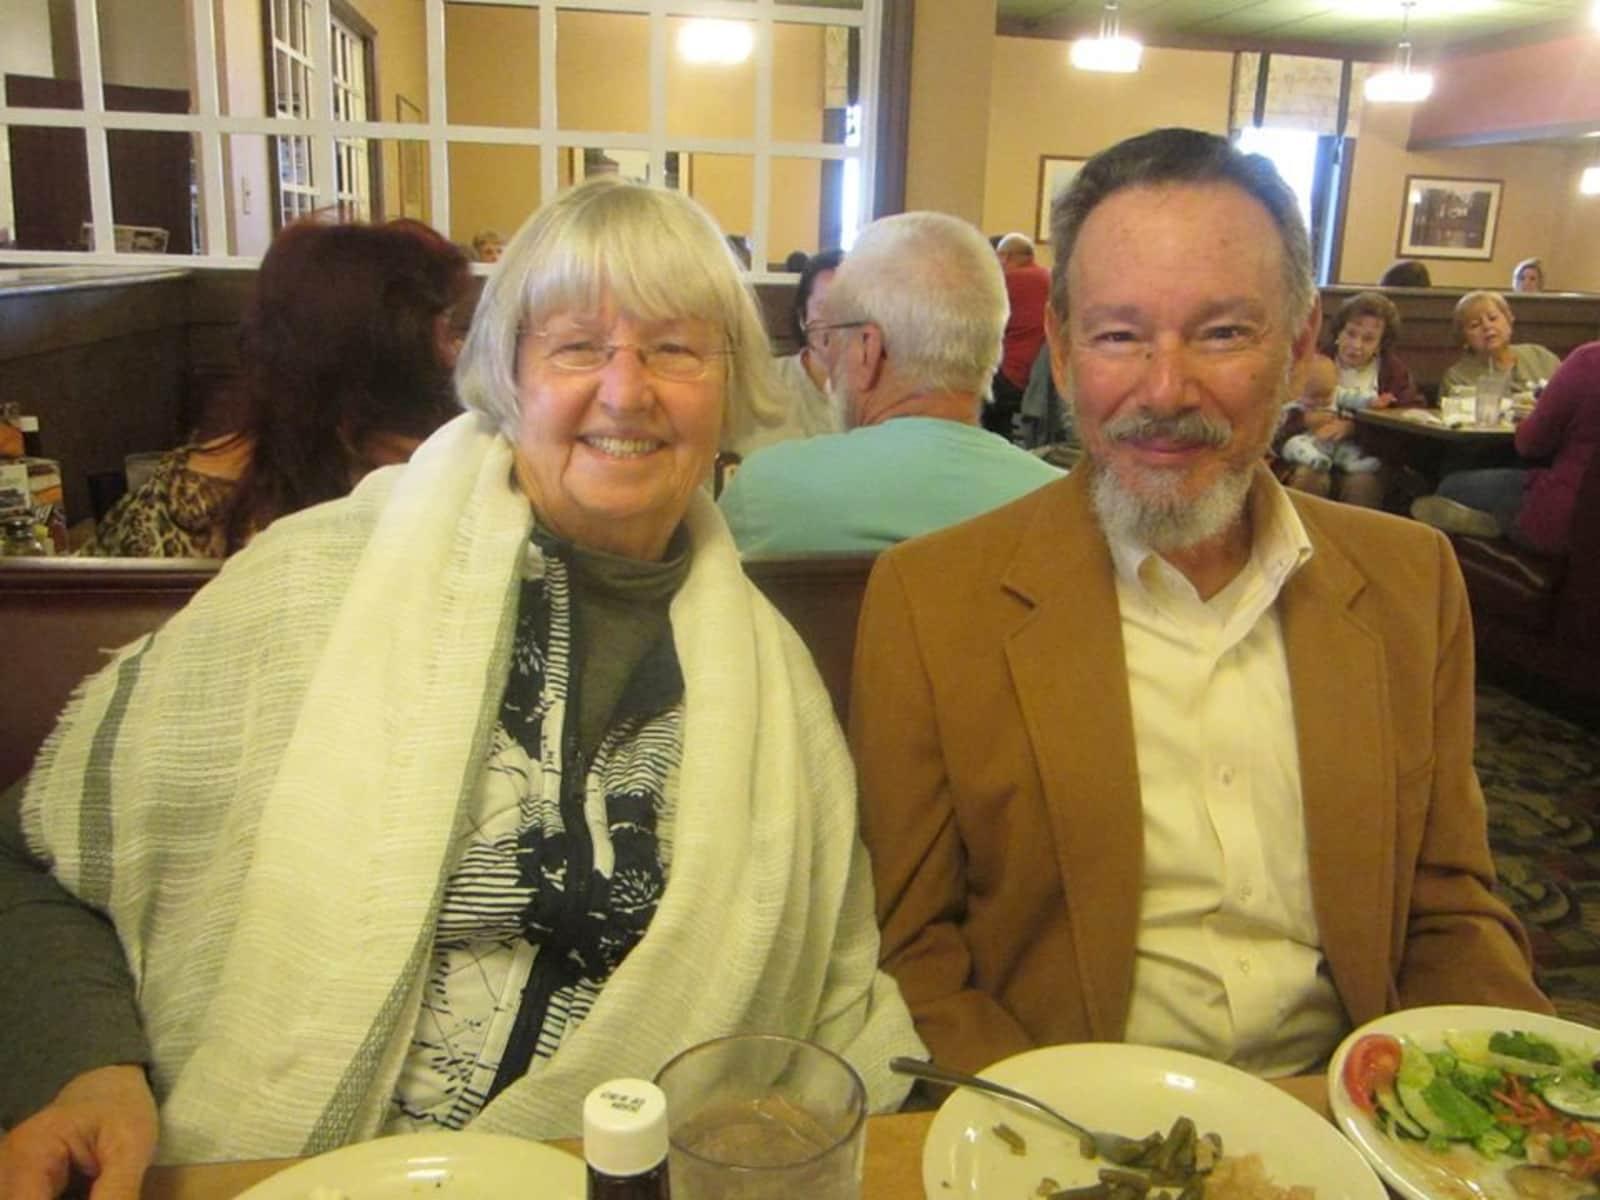 Ron & Ann from Blacksburg, Virginia, United States